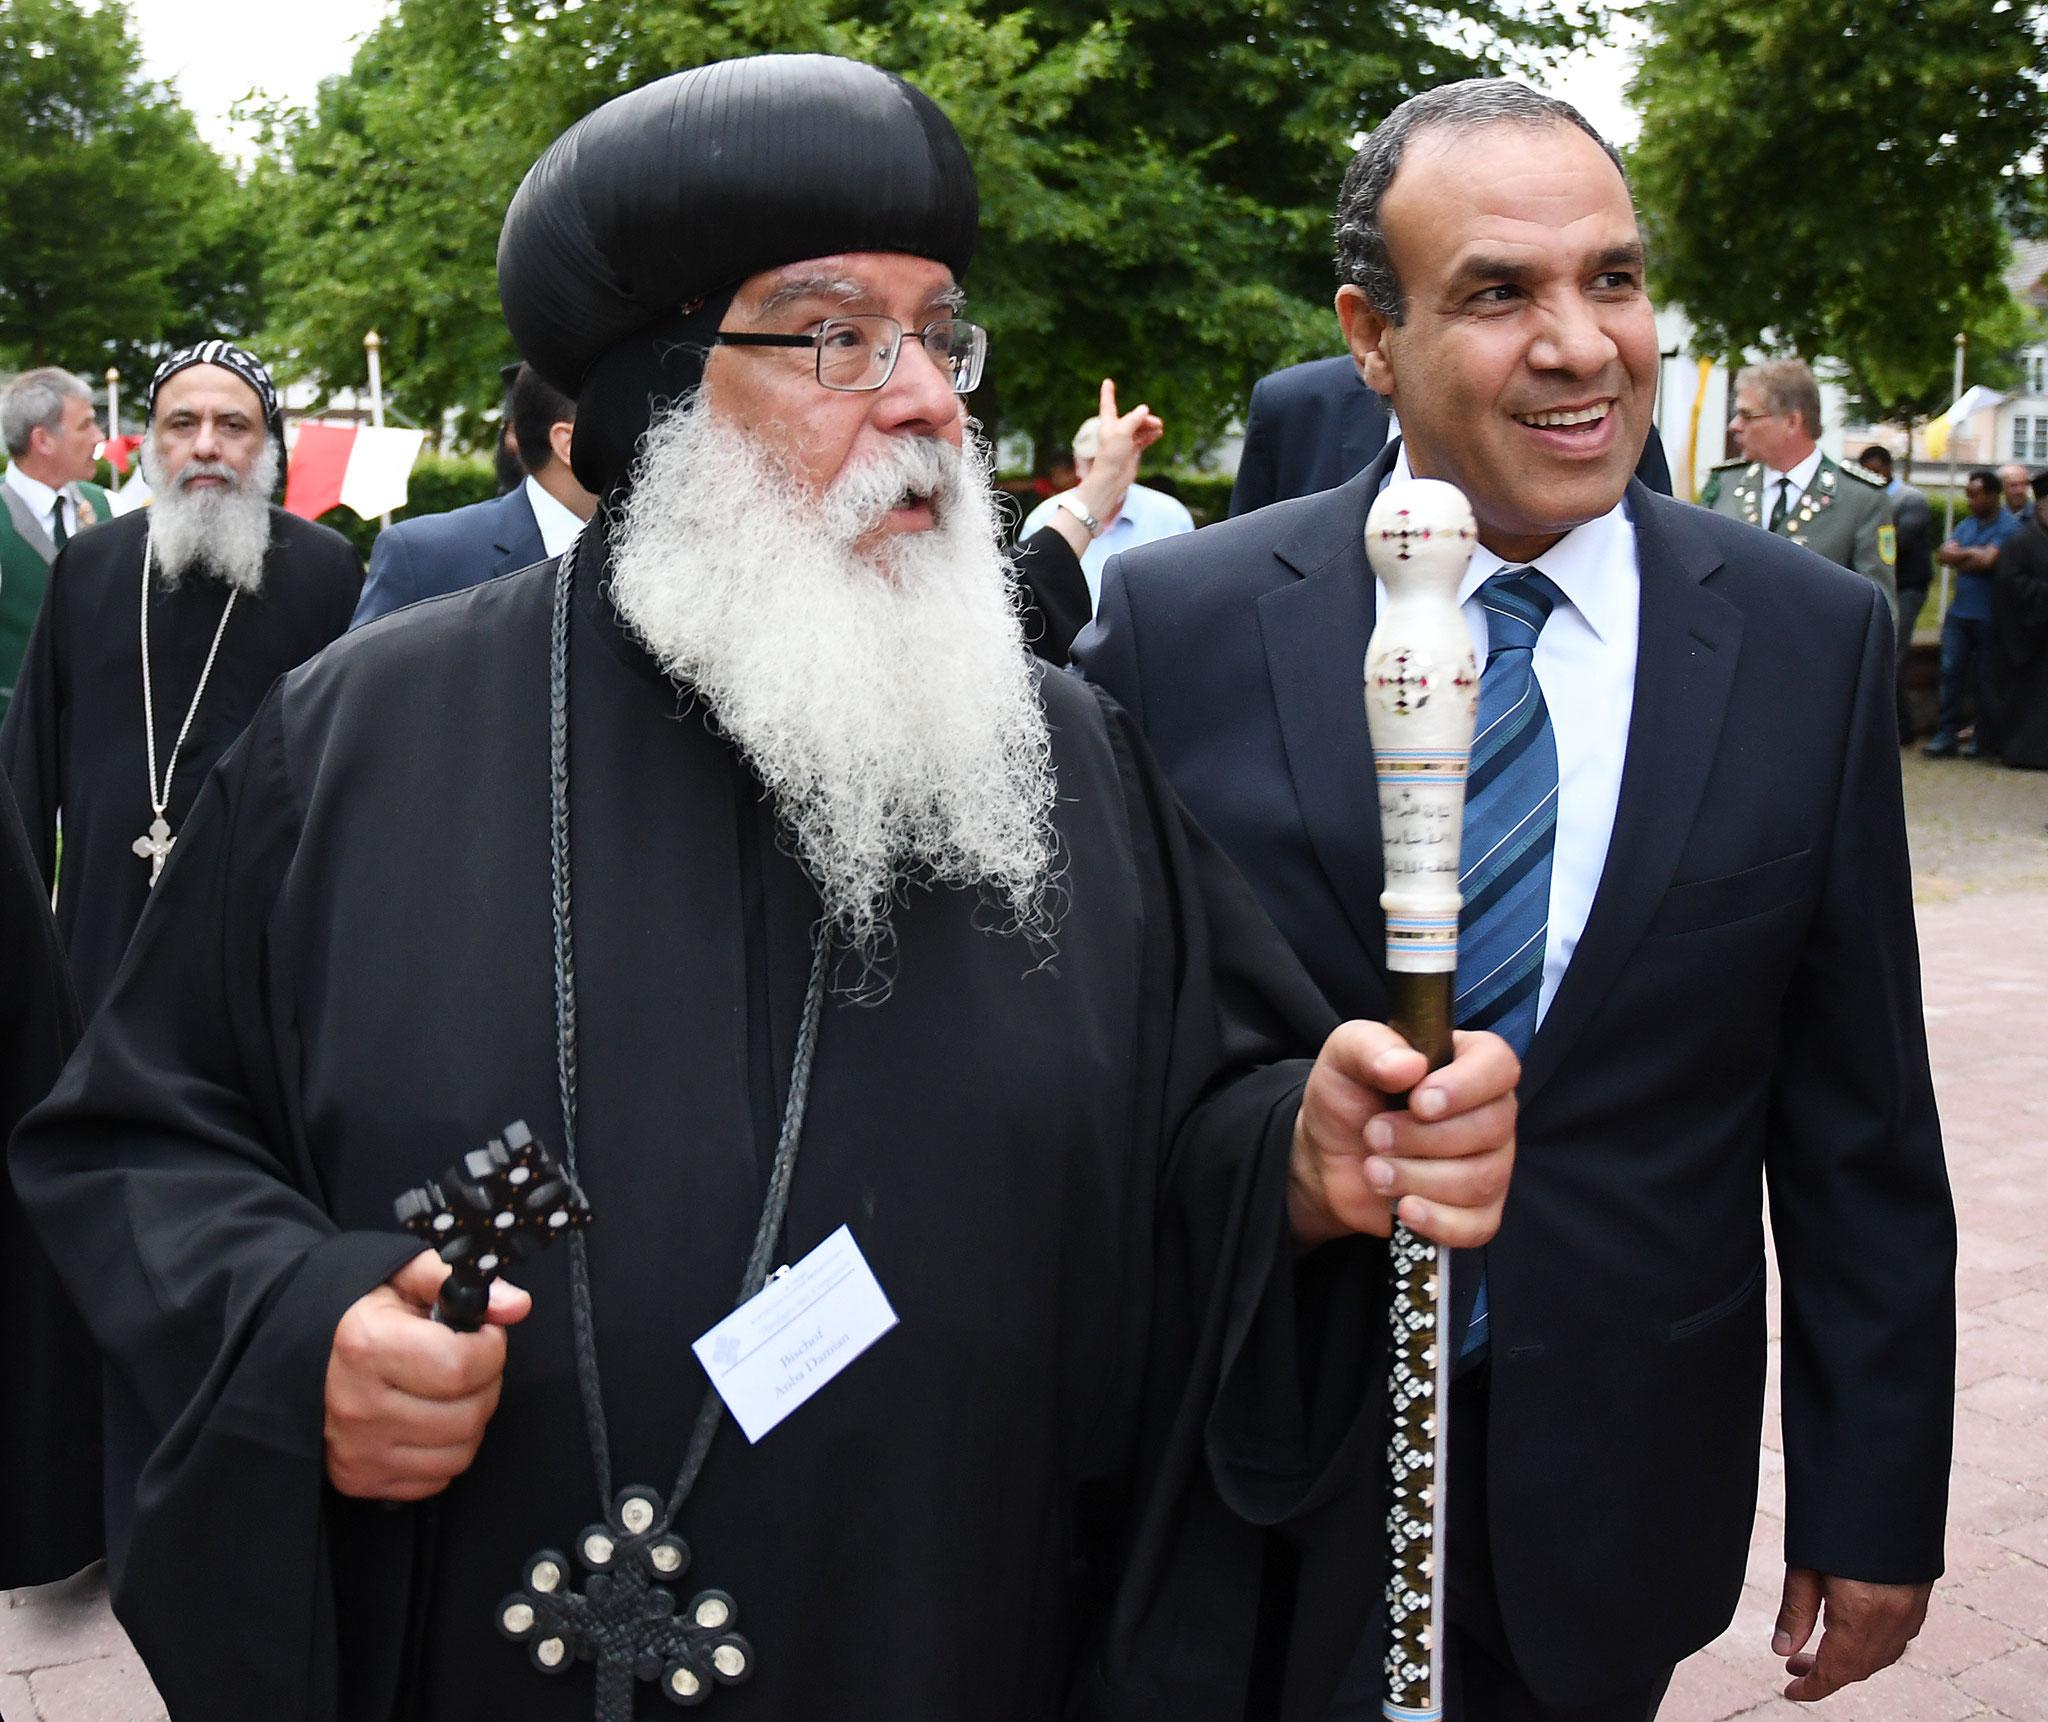 S.E. Bischof Anba Damian und S.E. Dr. Badr Abdelatty, Botschafter der Arabischen Republik Ägypten. Foto: Maria Hopp